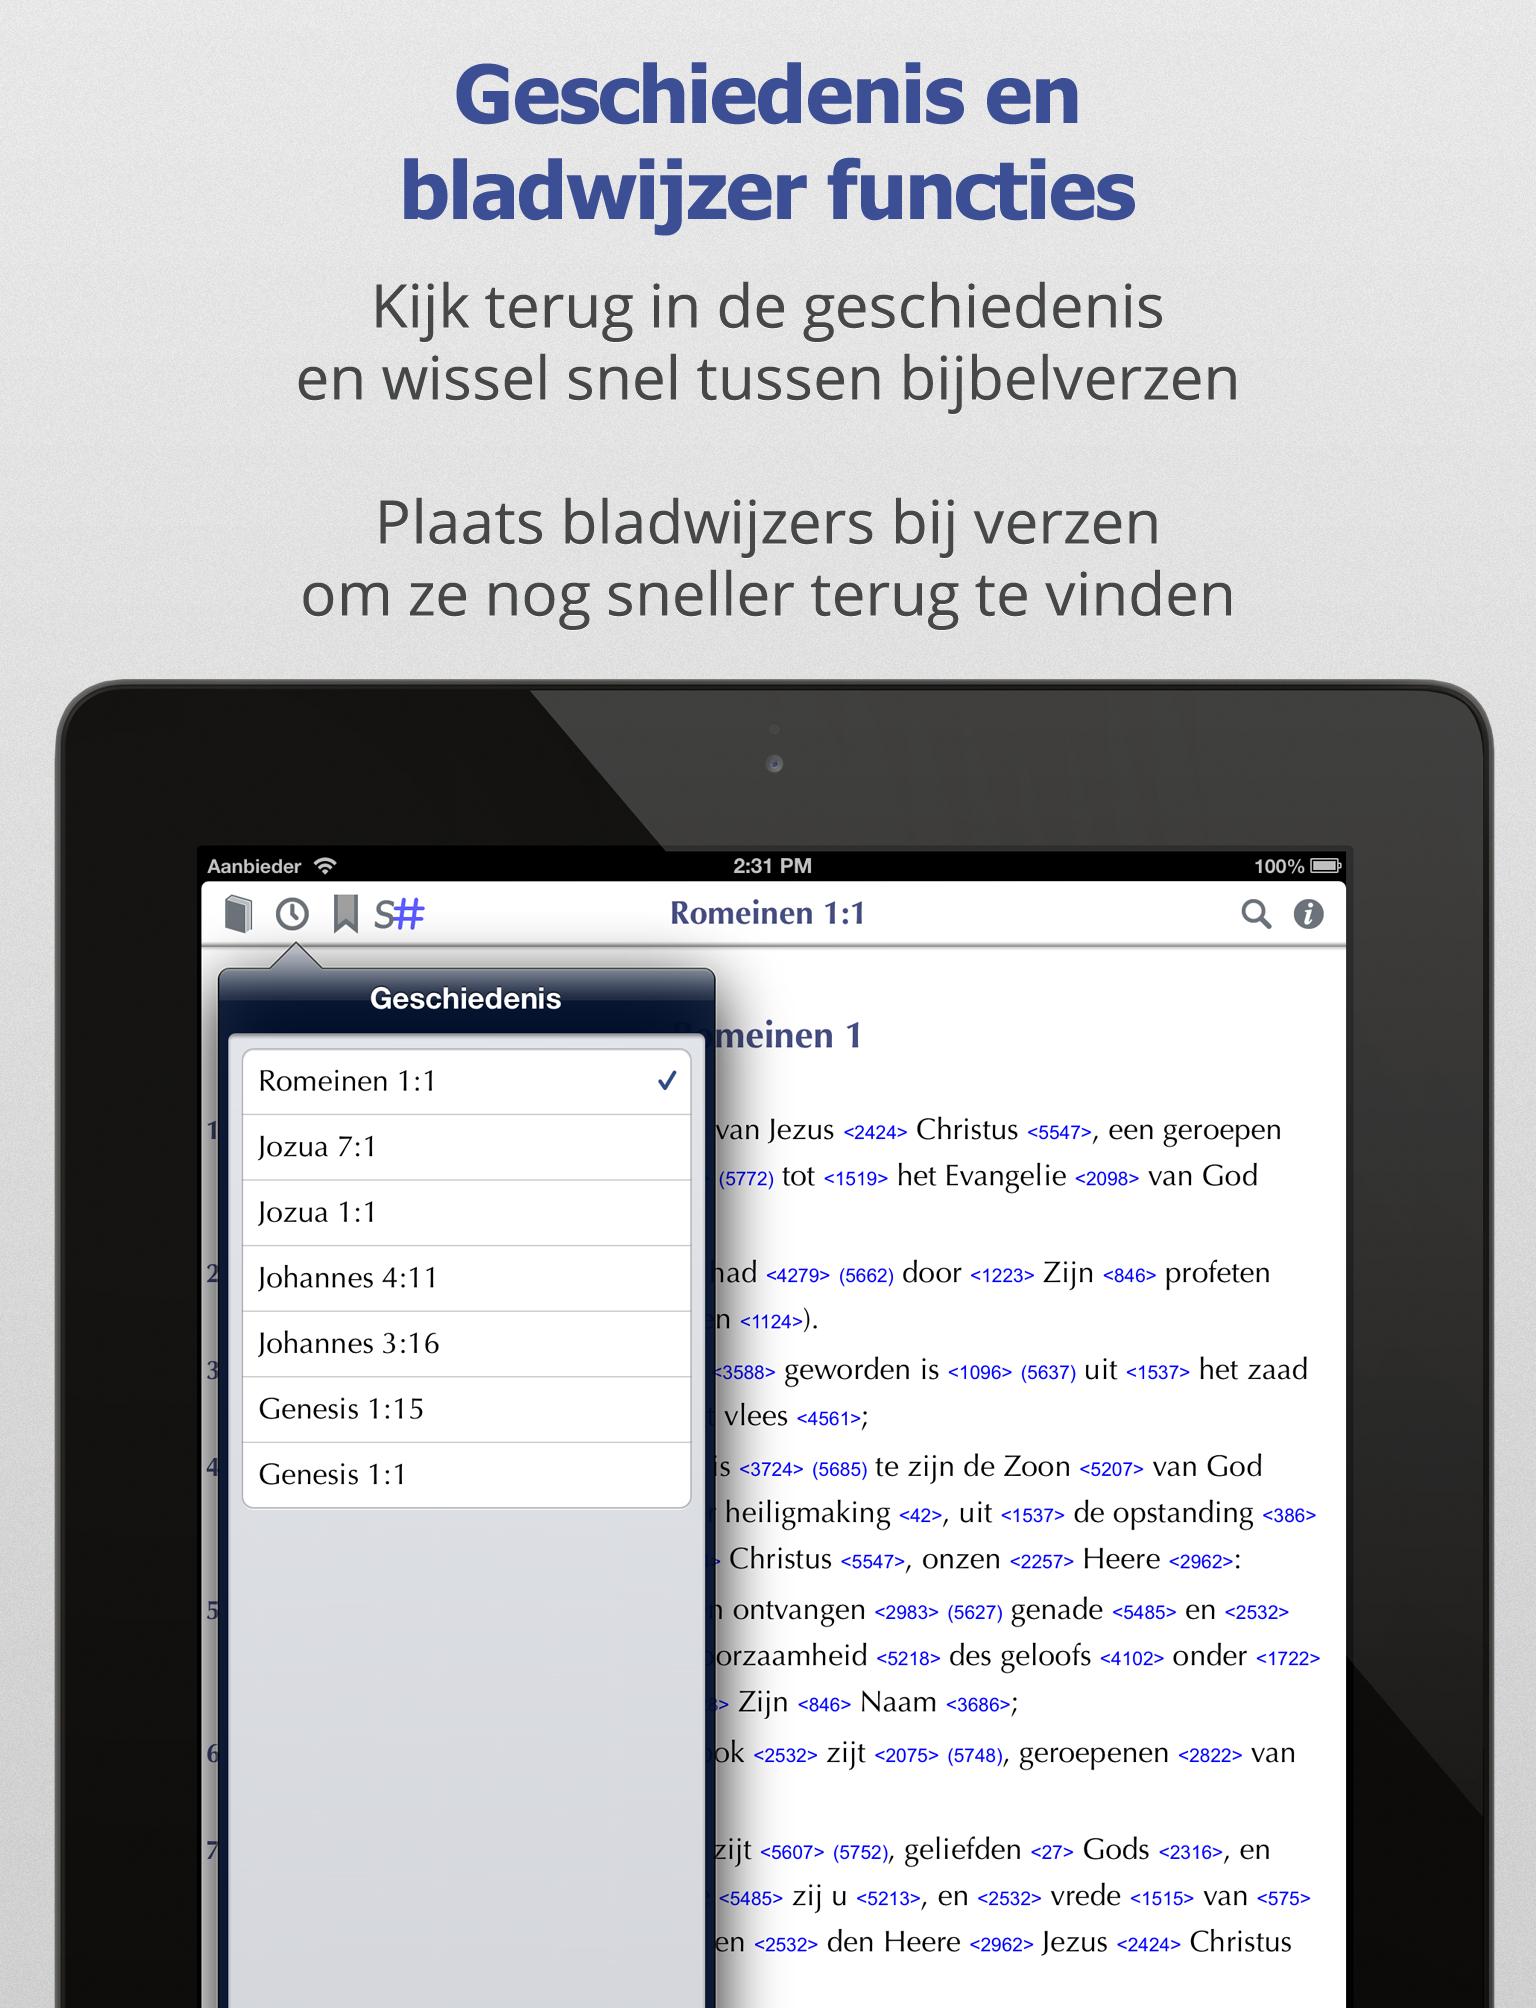 appStore-Screeshot-1536x2008-P-3.png